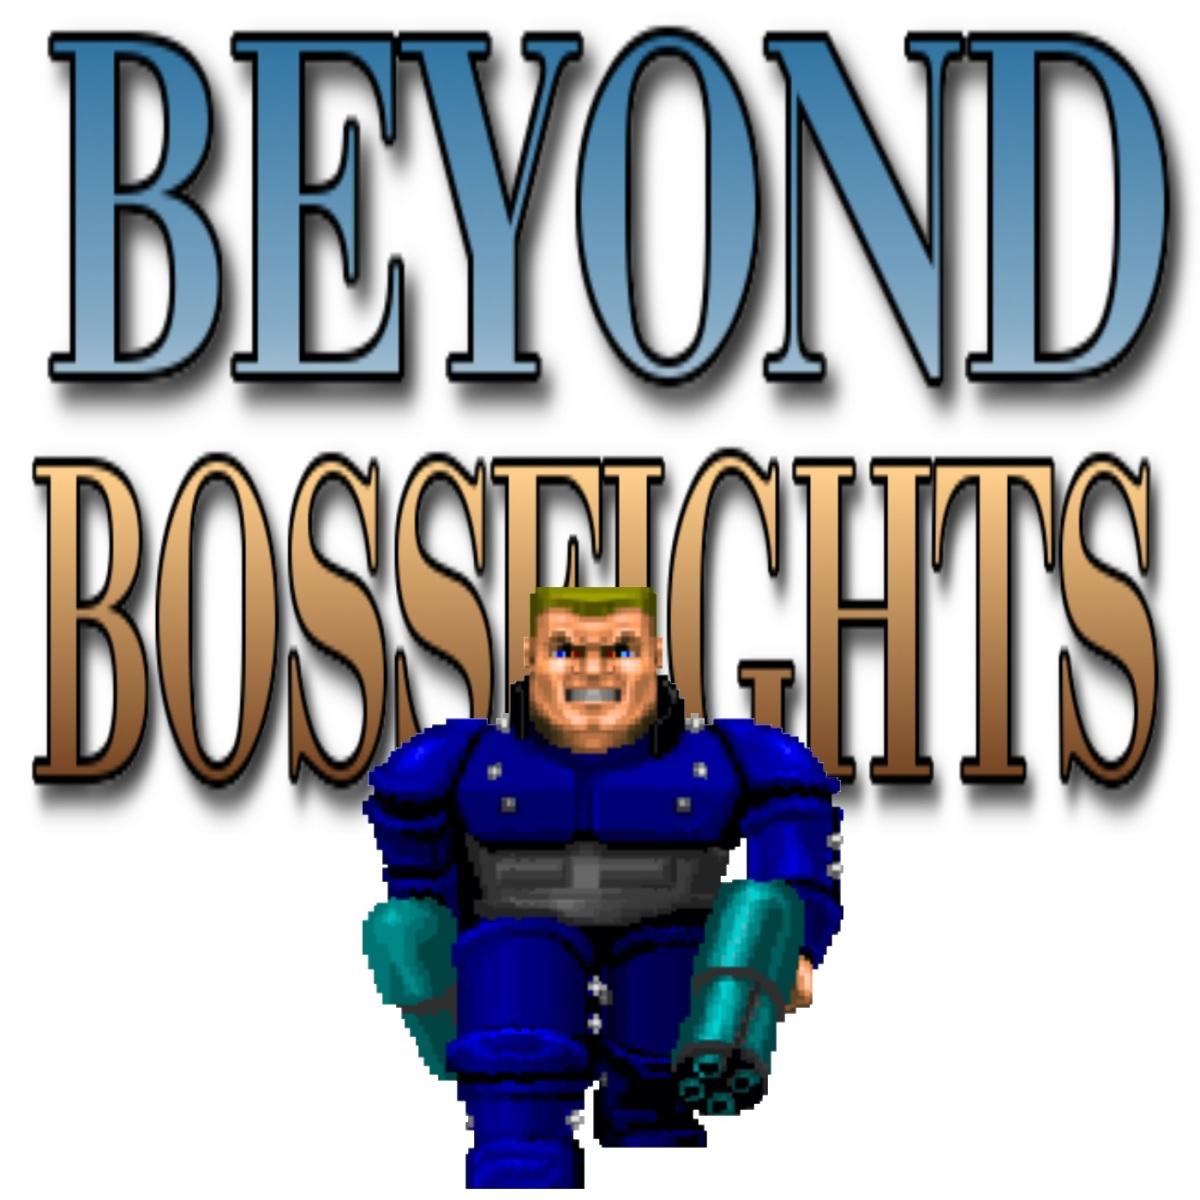 Beyond Bossfights Episode 12 - Lore